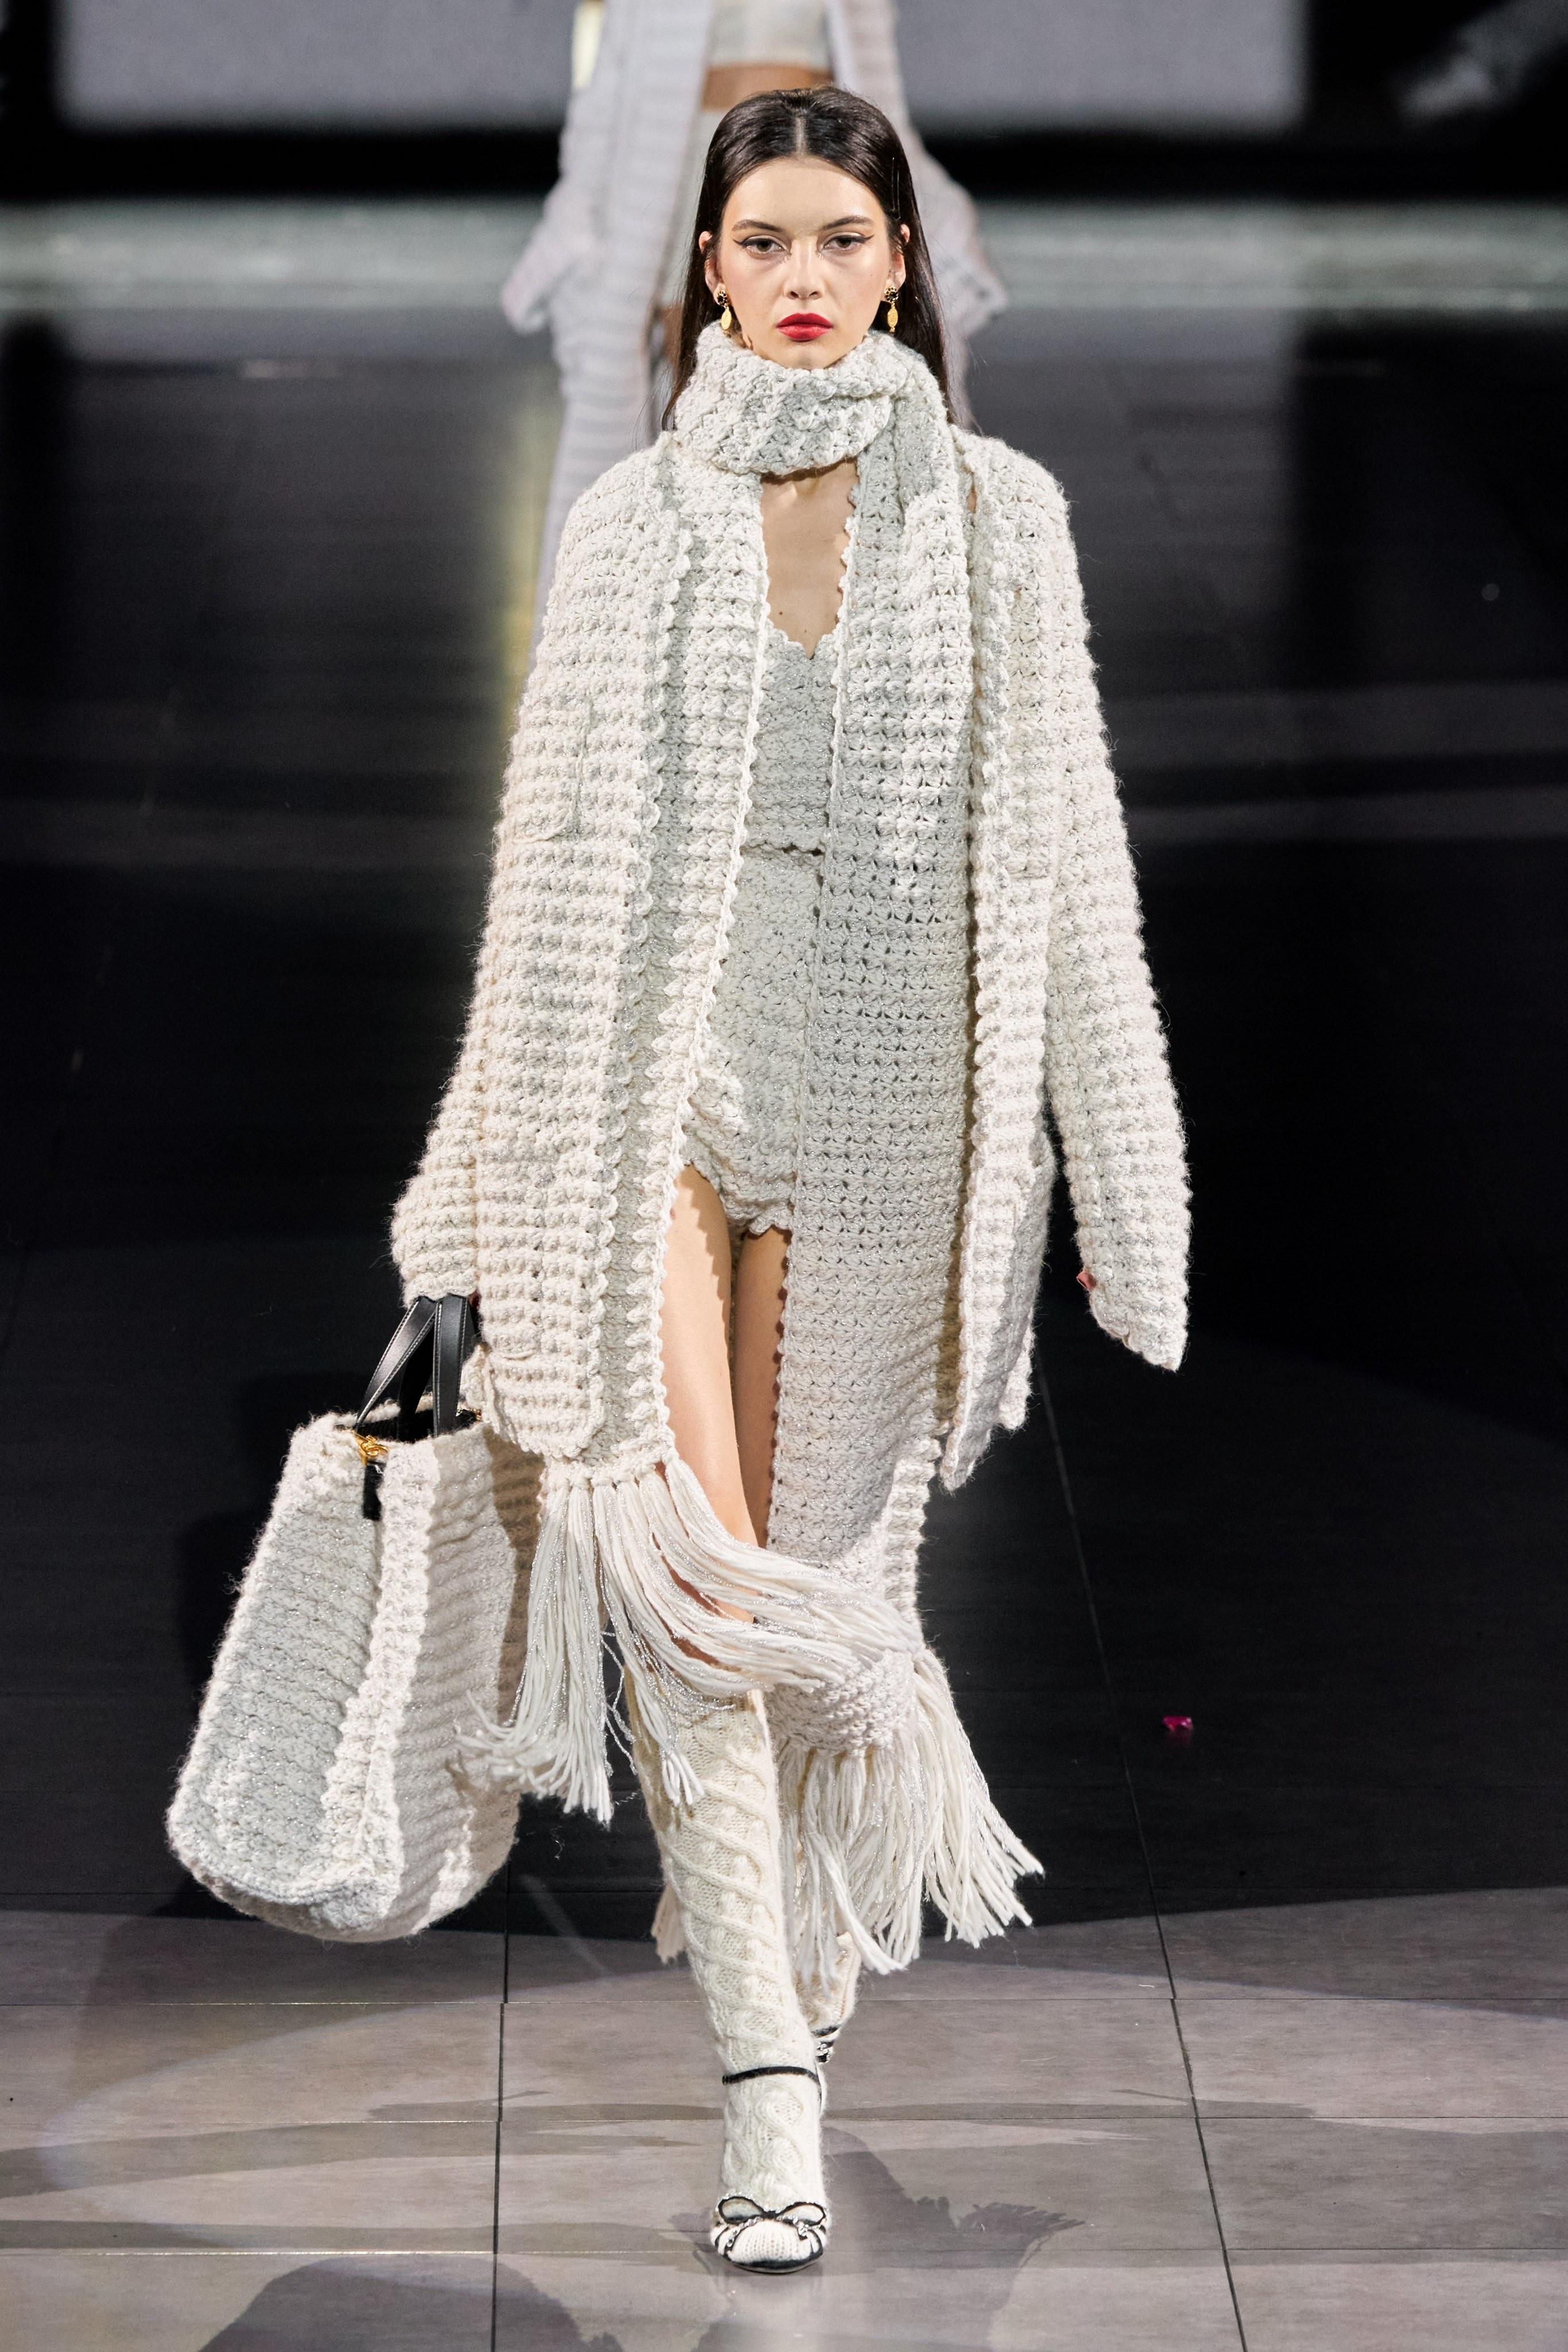 Khong co khach moi den Milan Fashion Week vi lo ngai virus corona hinh anh 44 ALE1245.jpg